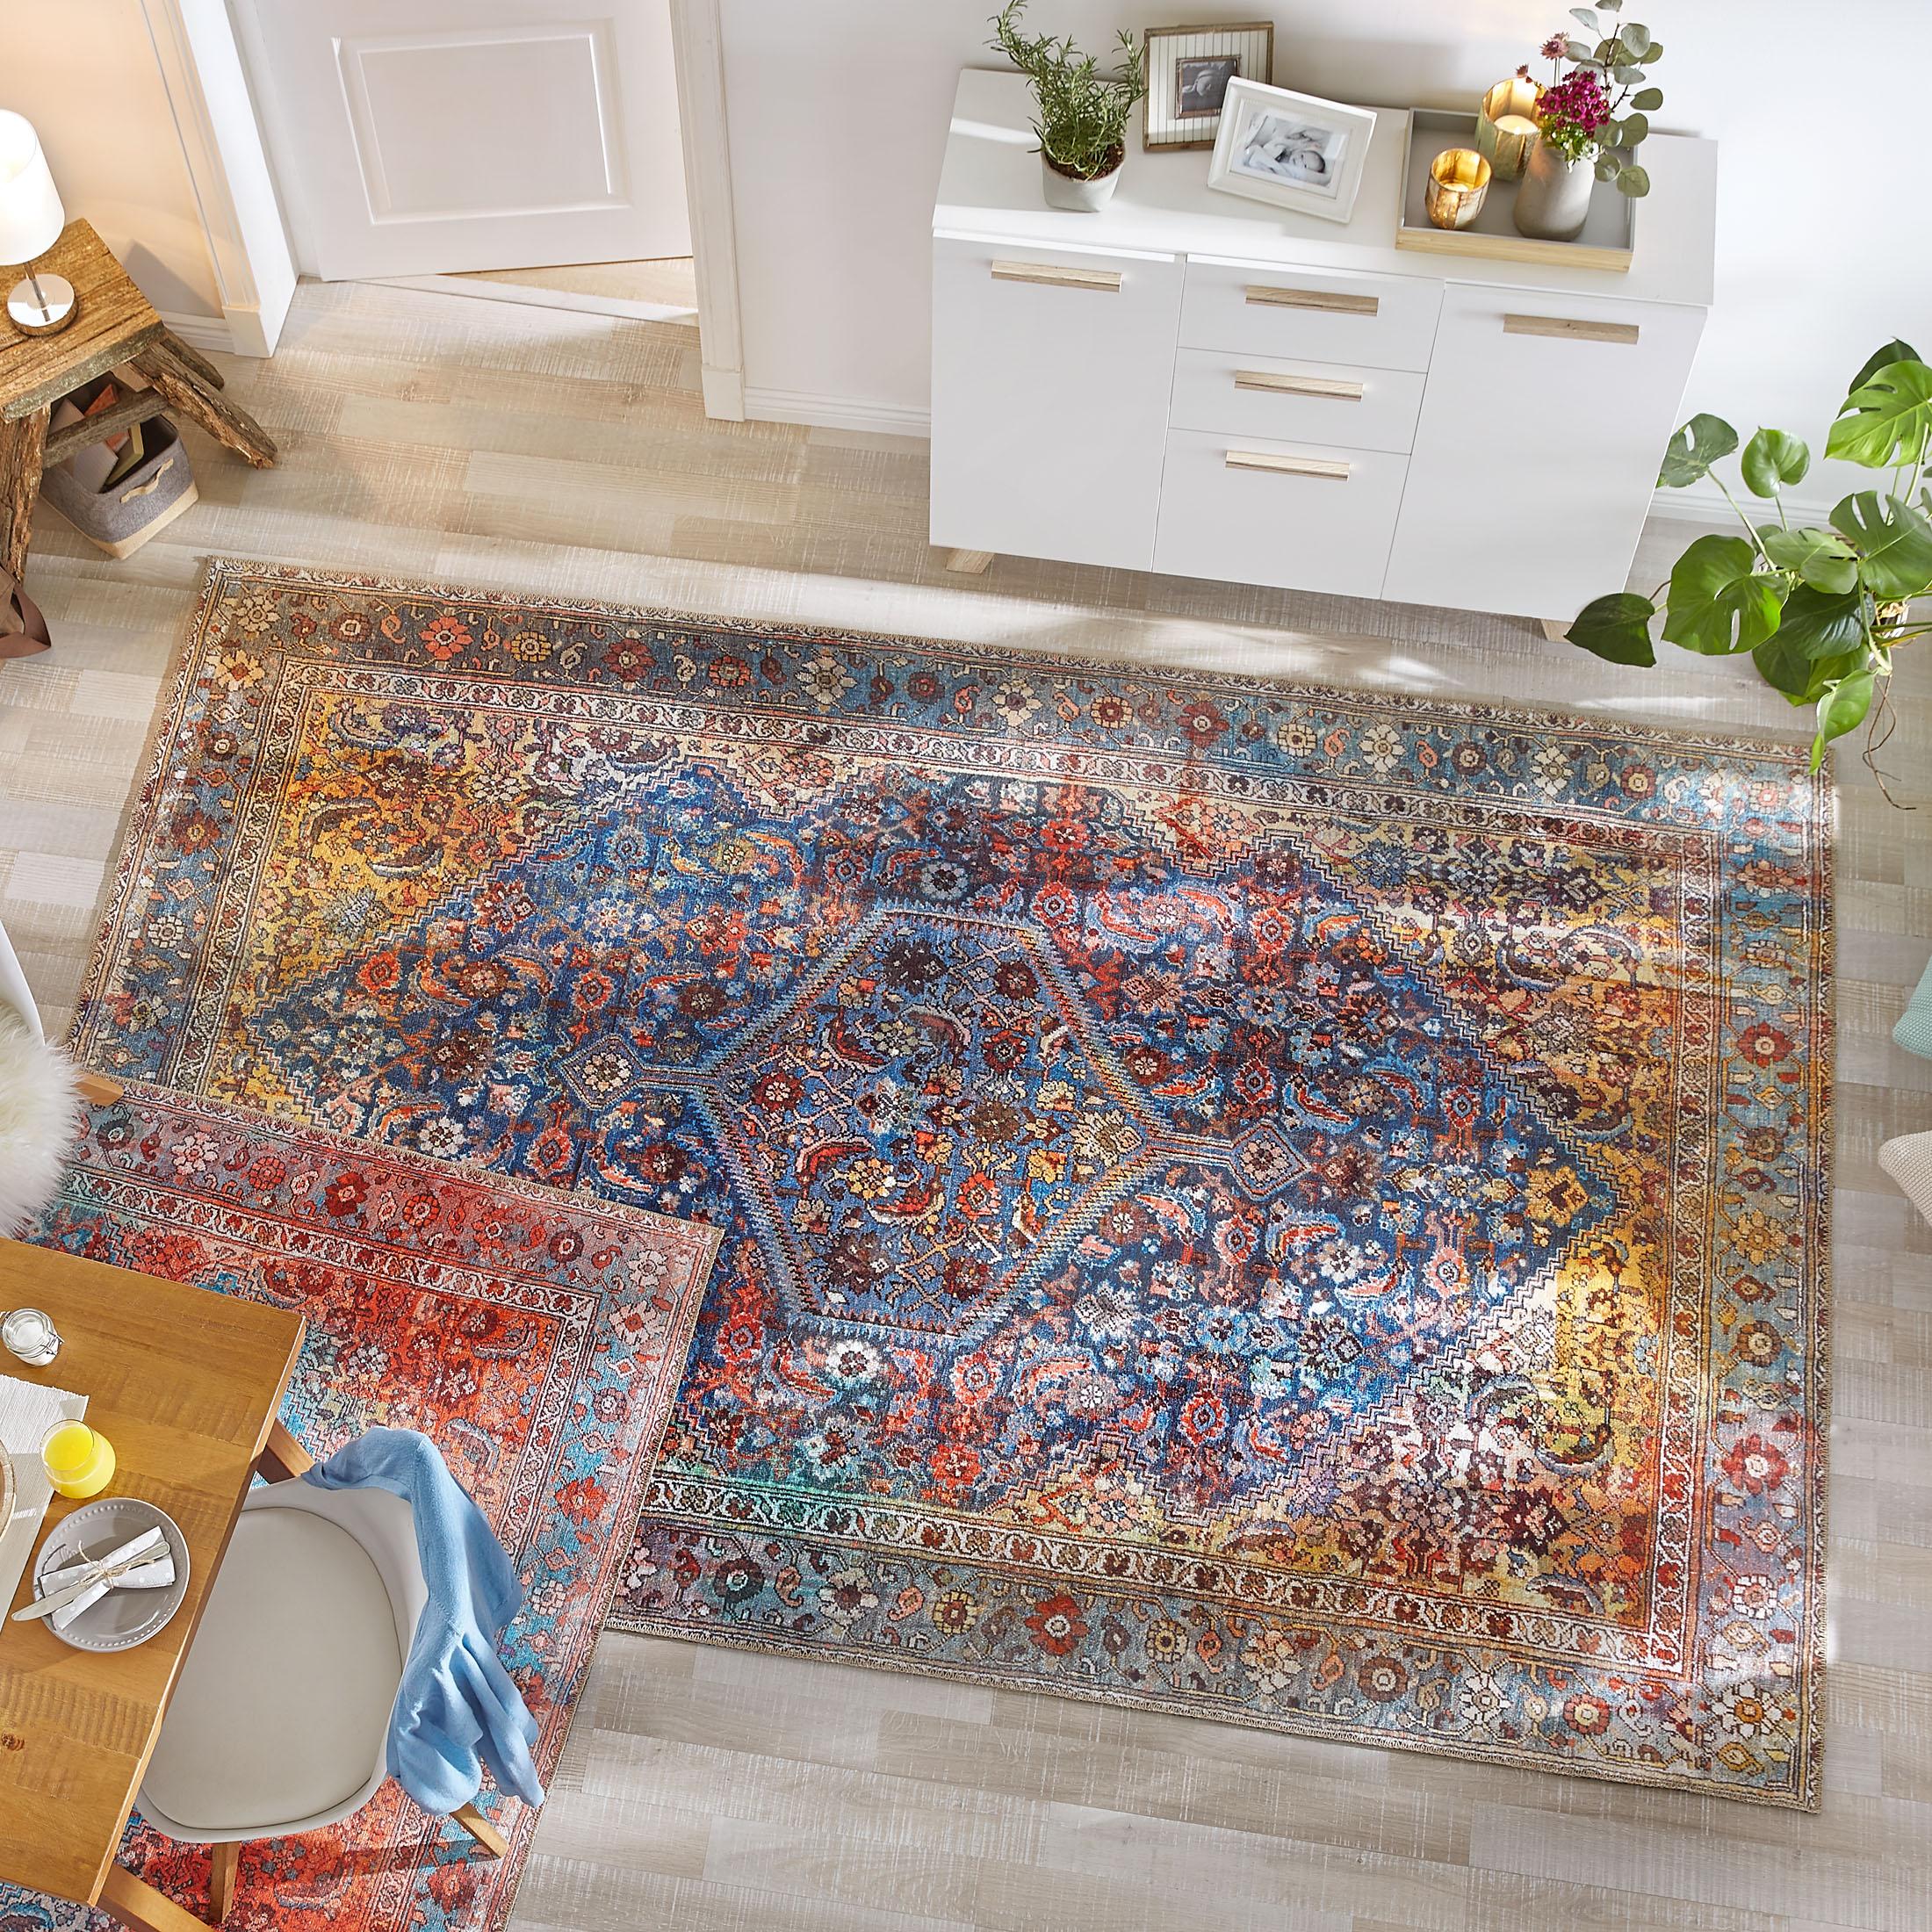 Ravine Vintage Teppich Von Kibek In Multicolor